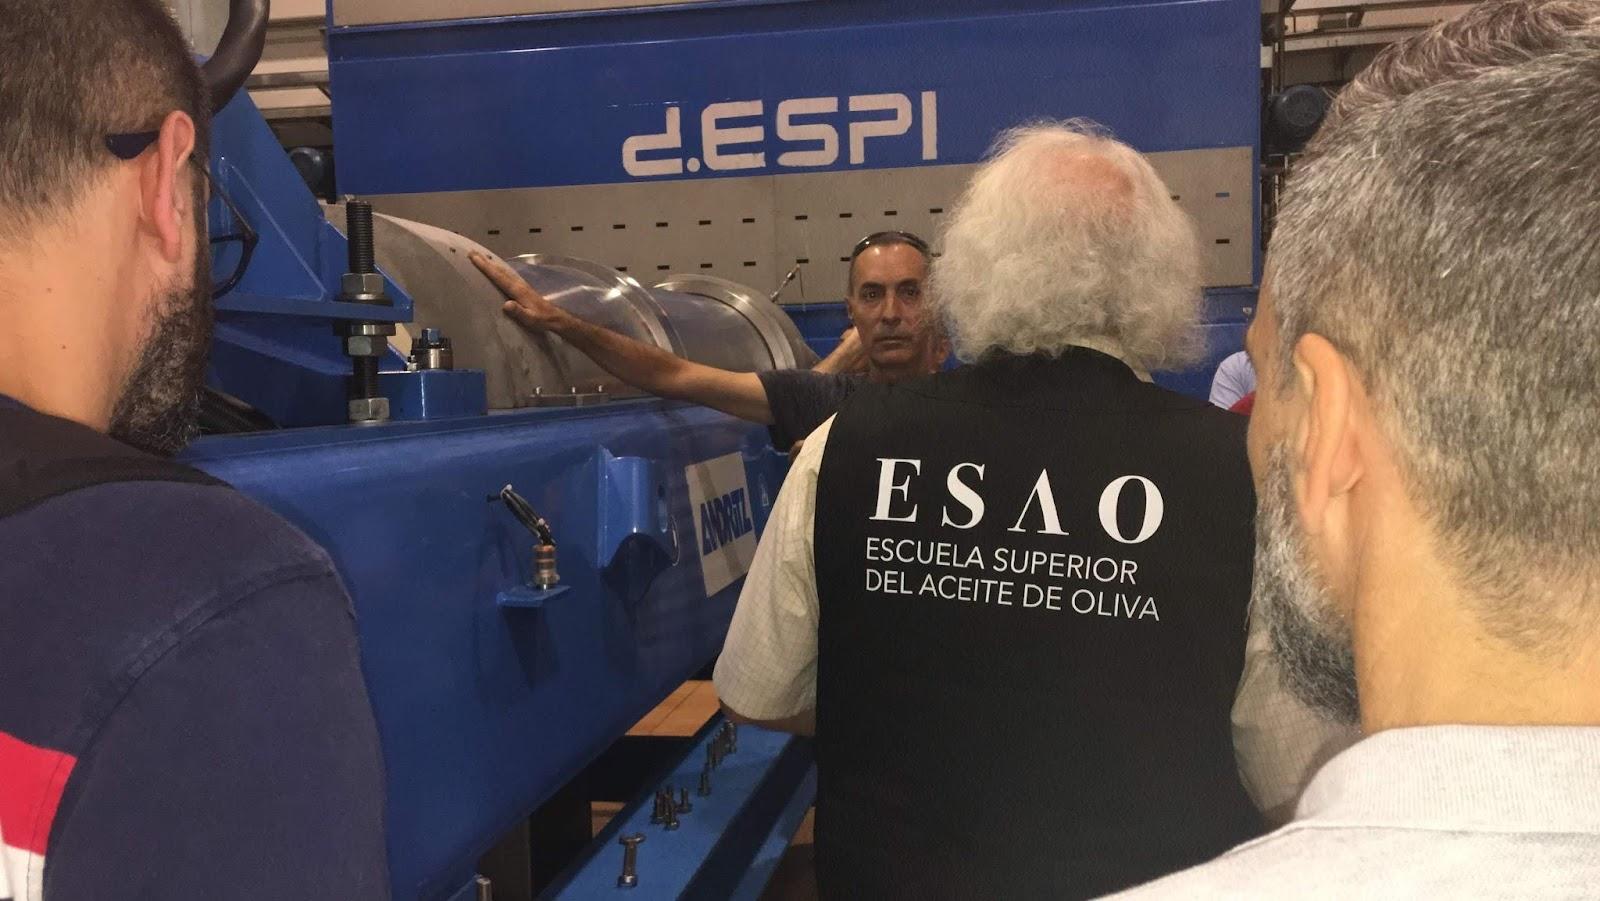 ESAO Olive Oil Master Miller